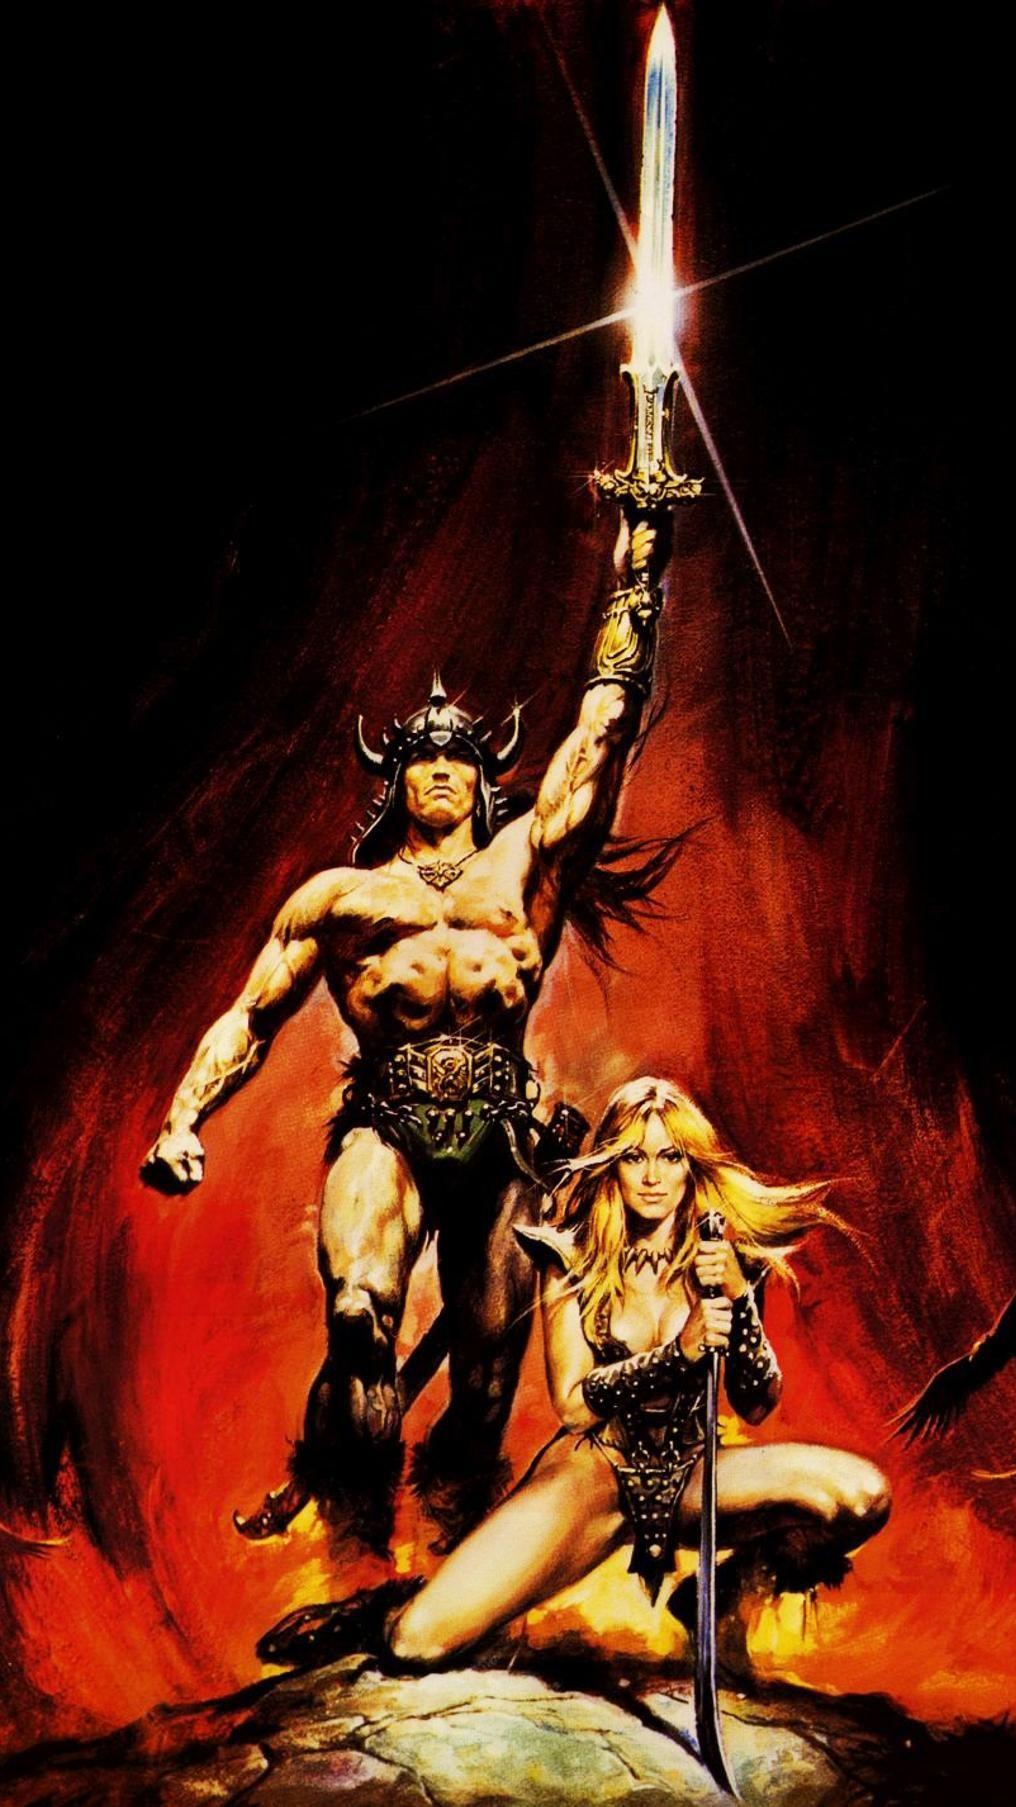 Conan The Barbarian 1982 Phone Wallpaper Moviemania Conan The Barbarian 1982 Barbarian Movie Conan The Barbarian